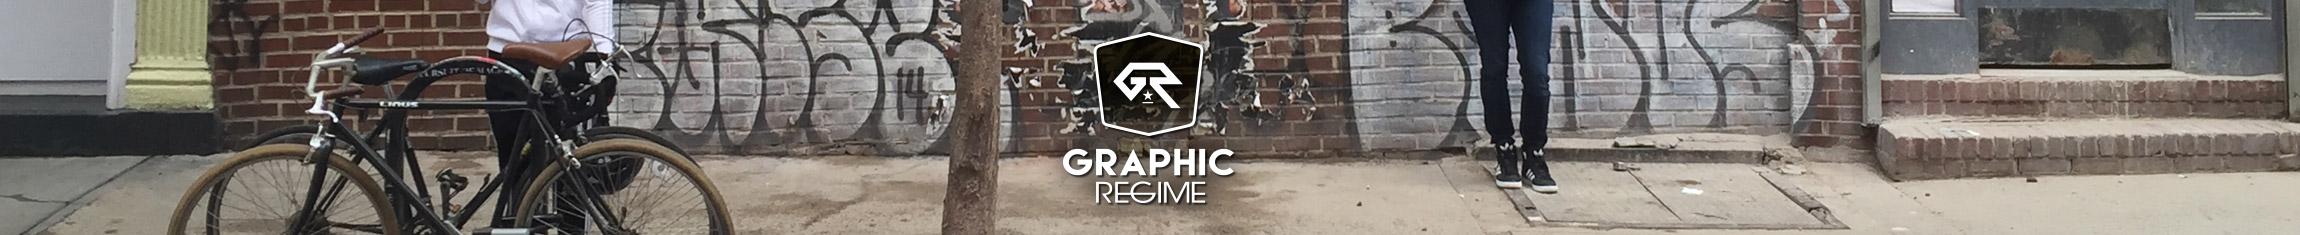 Graphic Regime footer New York urban graffiti street scene